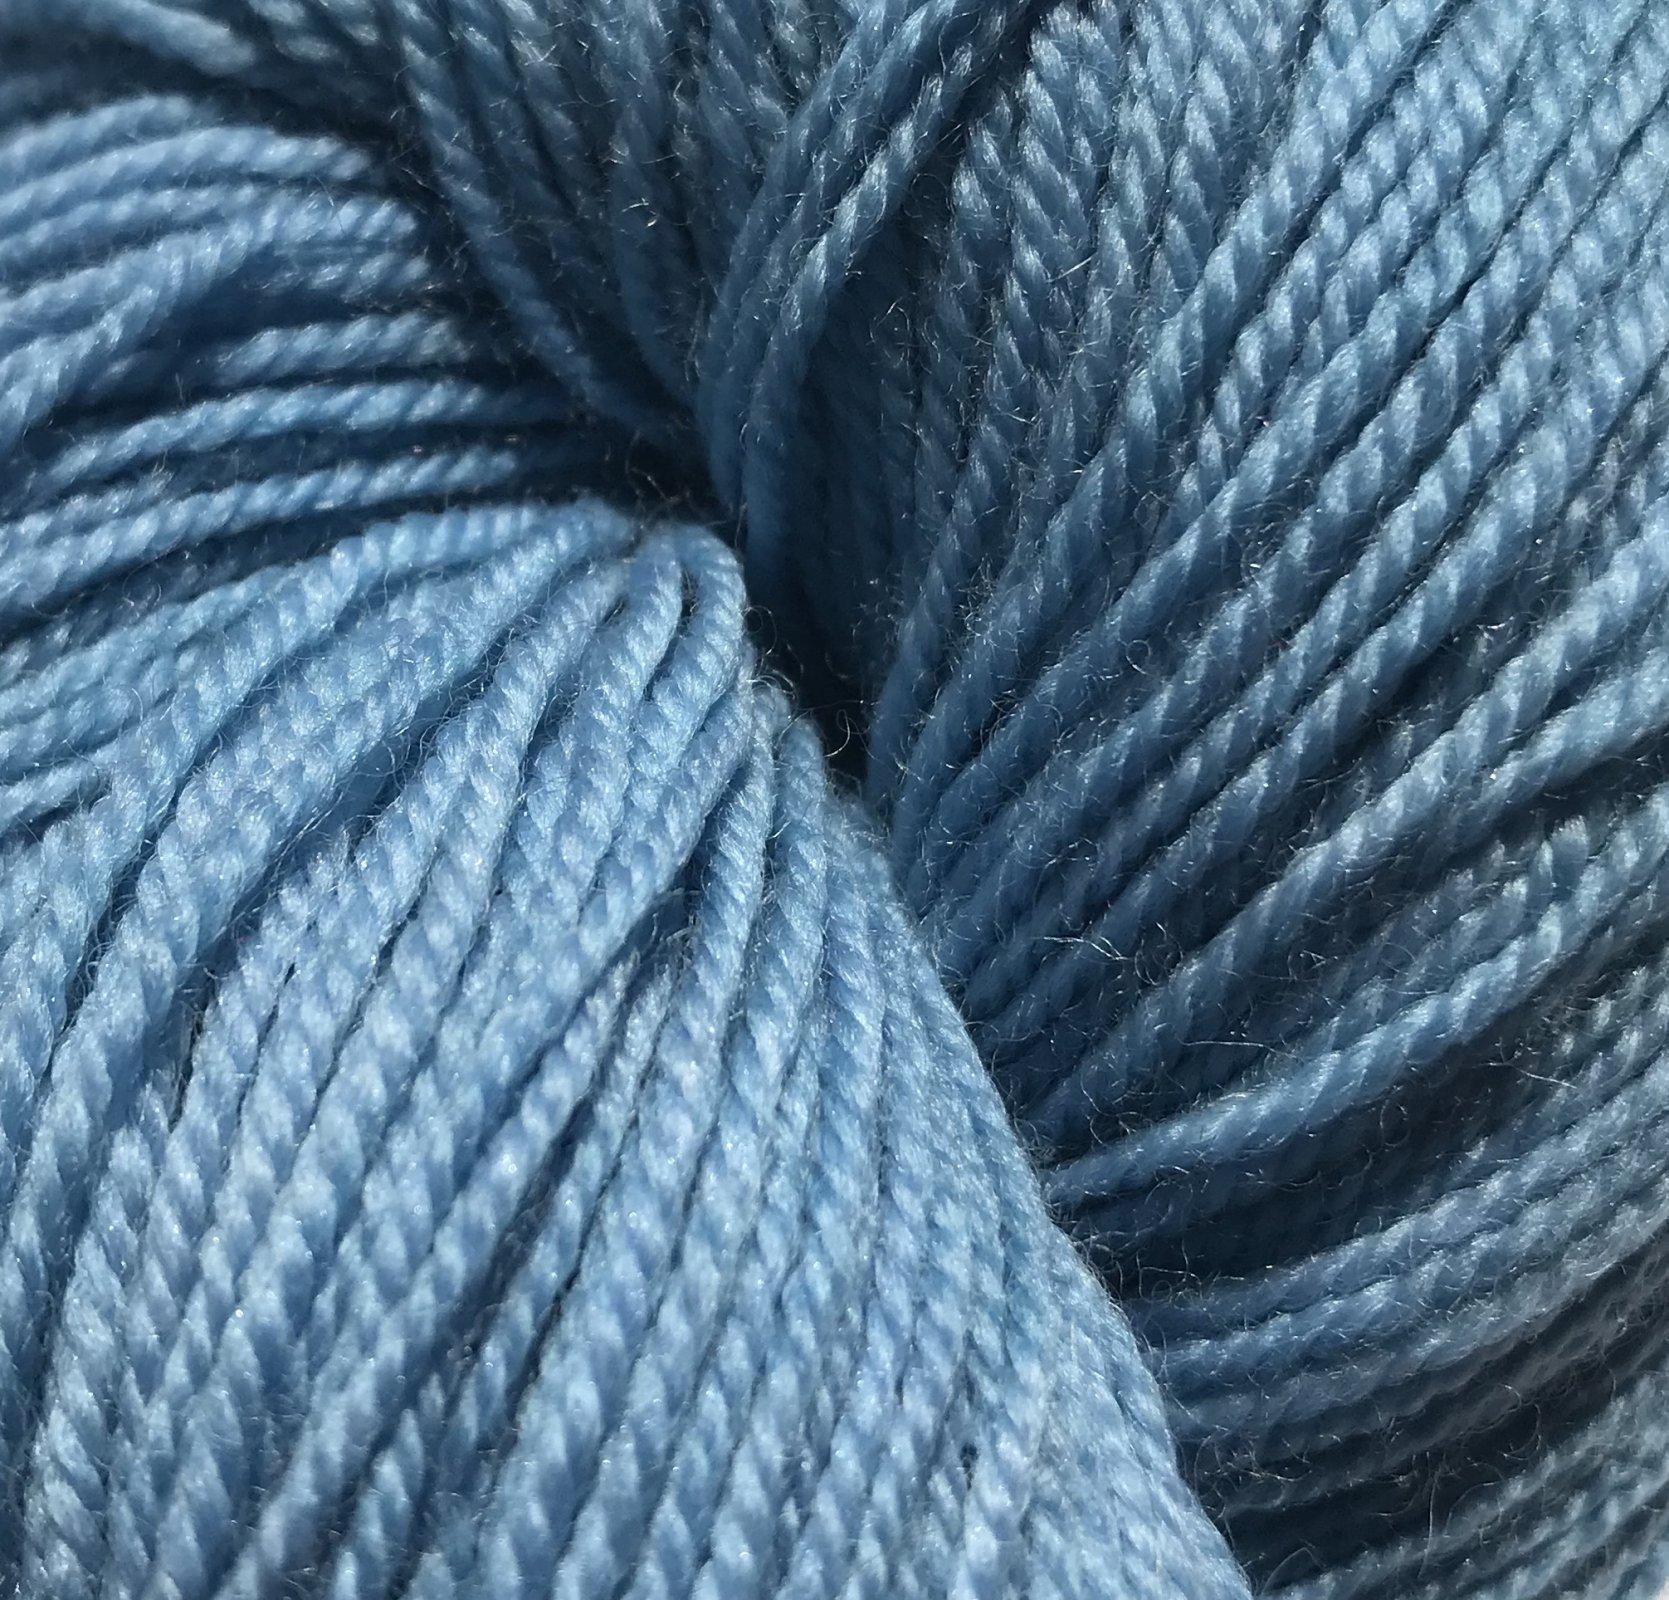 Three Irish Girls Binge Knit Sock - Erotic Friend Fiction